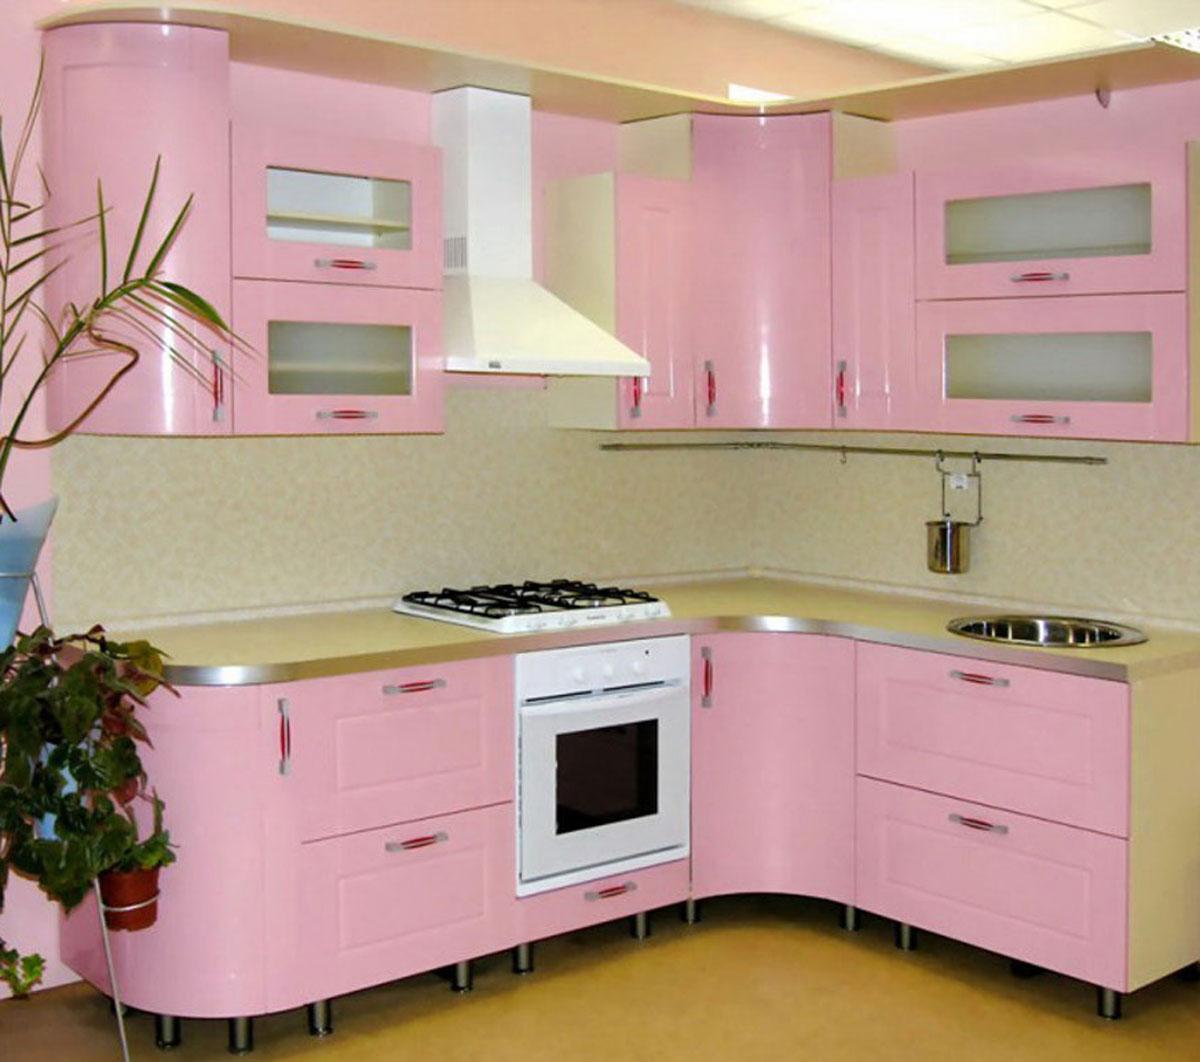 кухни на заказ дешево: Кухни на заказ в Ярославле